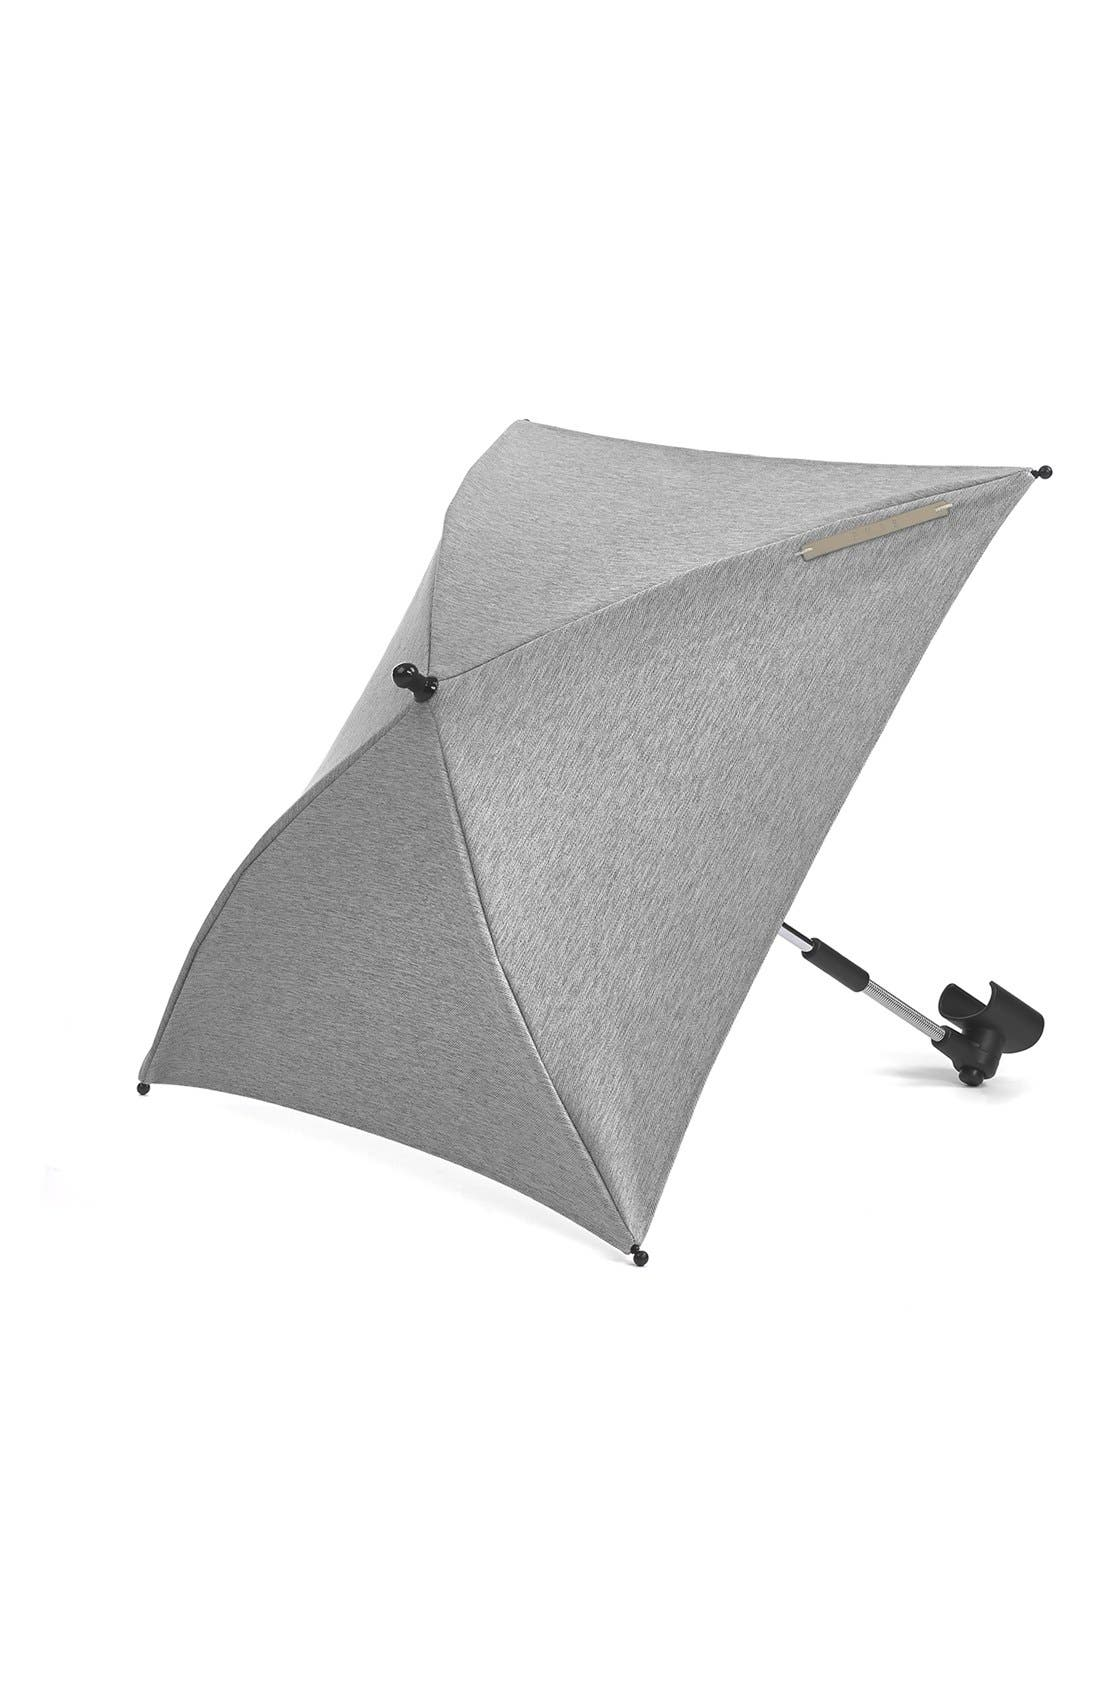 Alternate Image 1 Selected - Mutsy 'Igo - Pure Fog' Stroller Umbrella